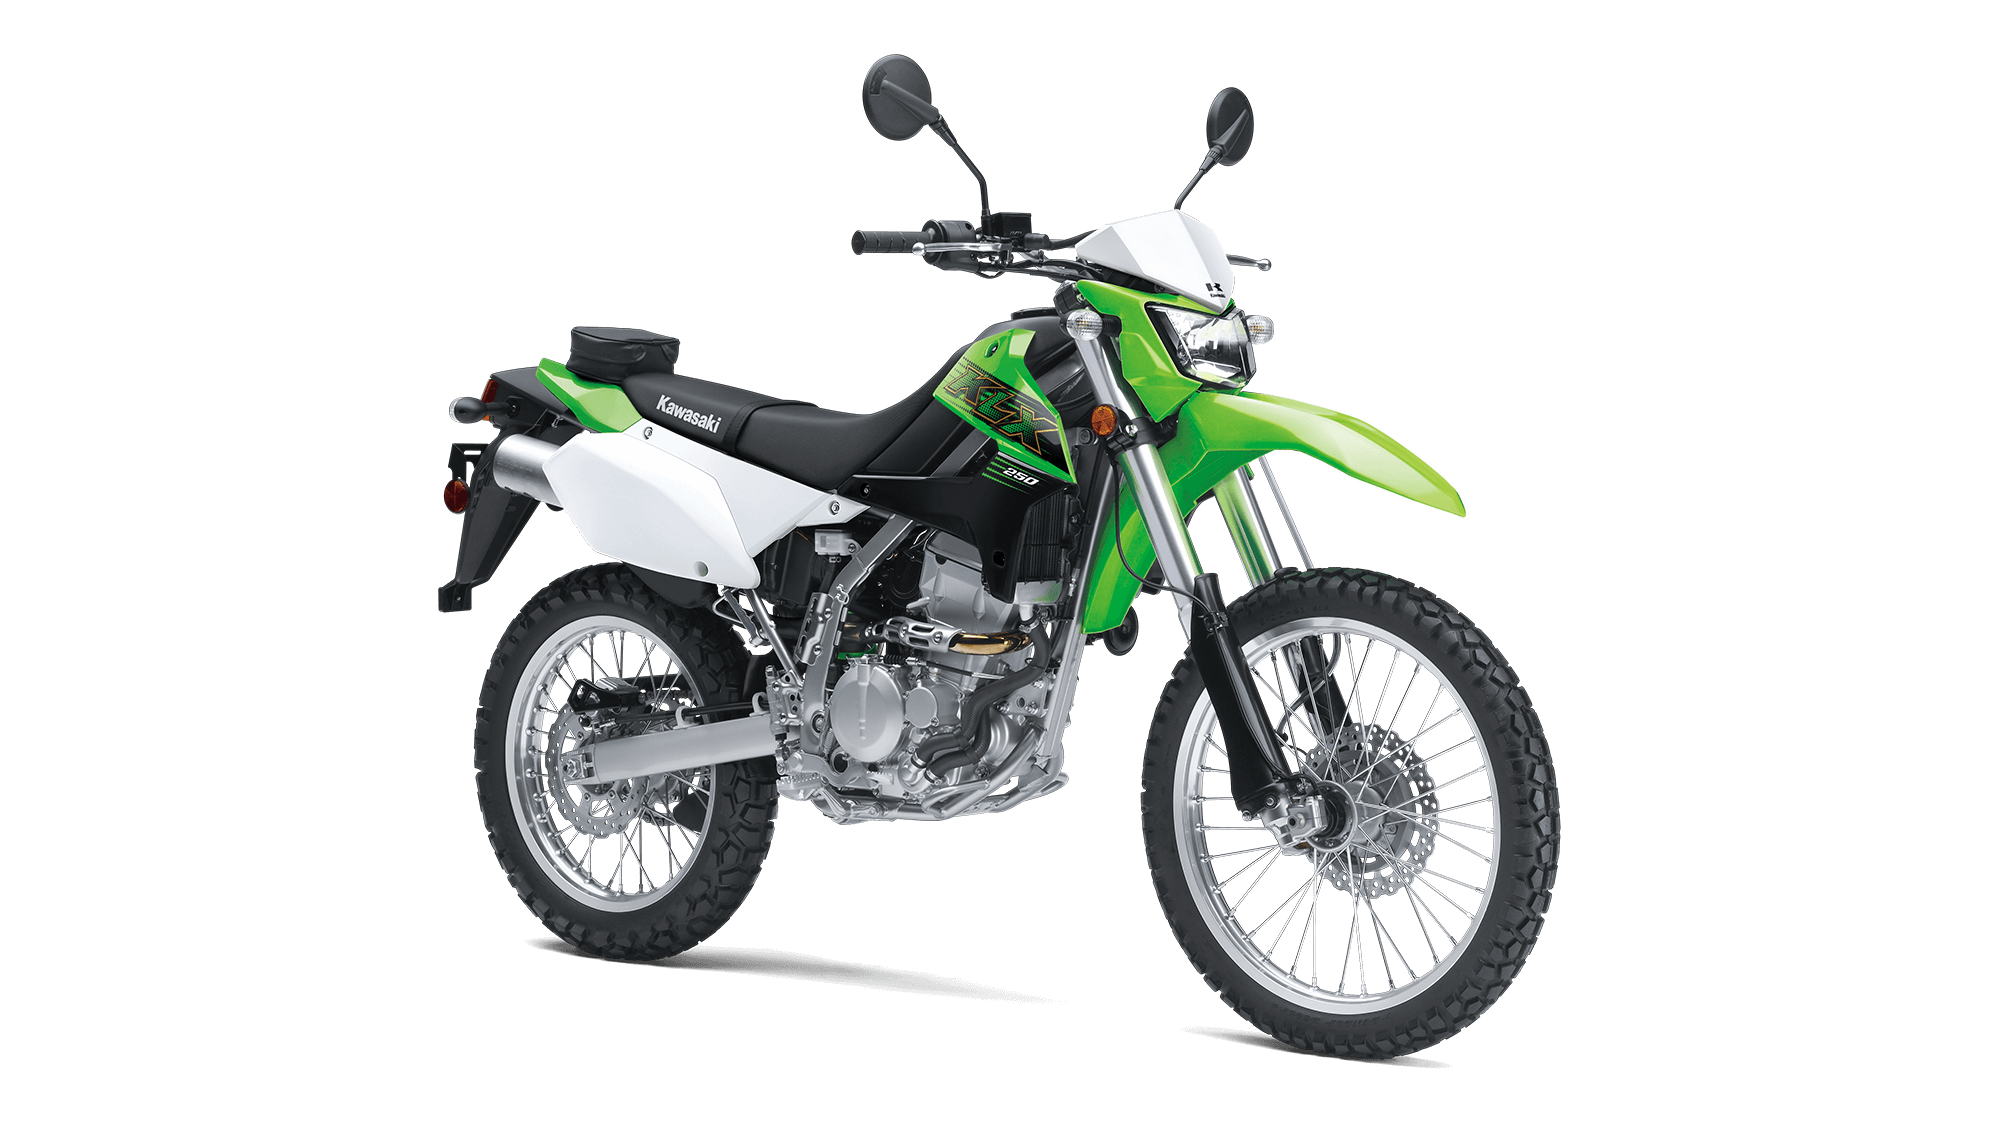 Klx 250 Klr Klx Motorcycle By Kawasaki